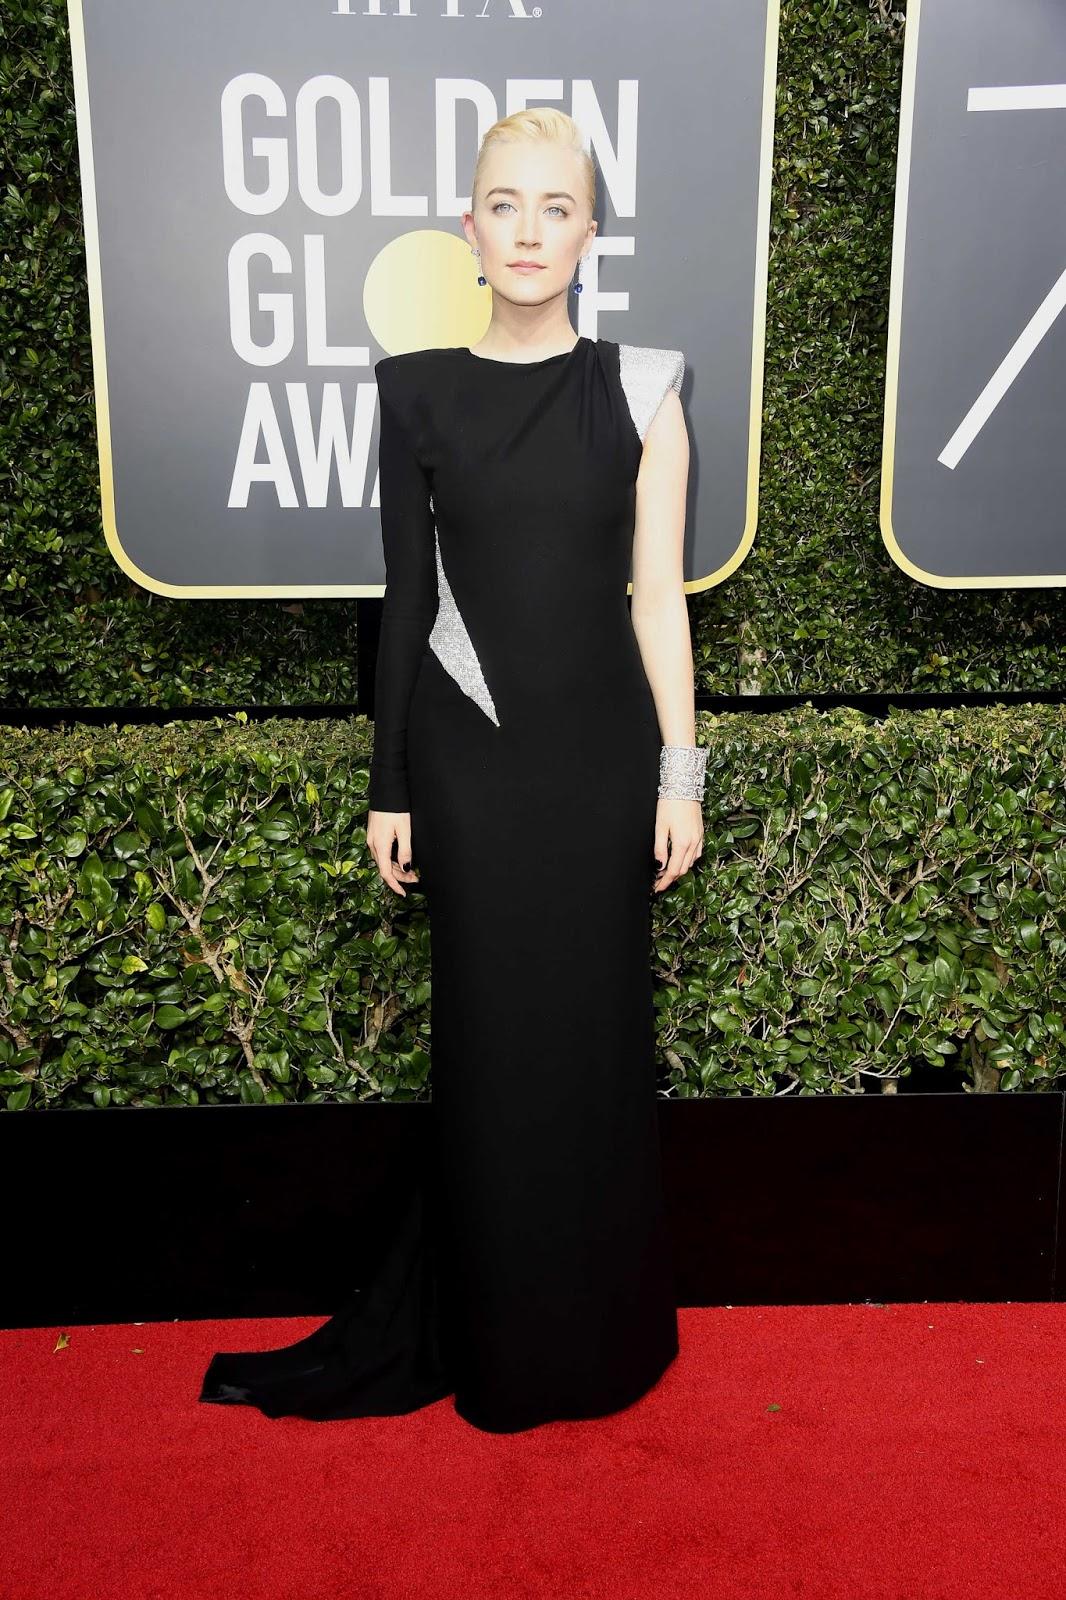 Saoirse Ronan Posing on the Red Carpet at Golden Globe Awards